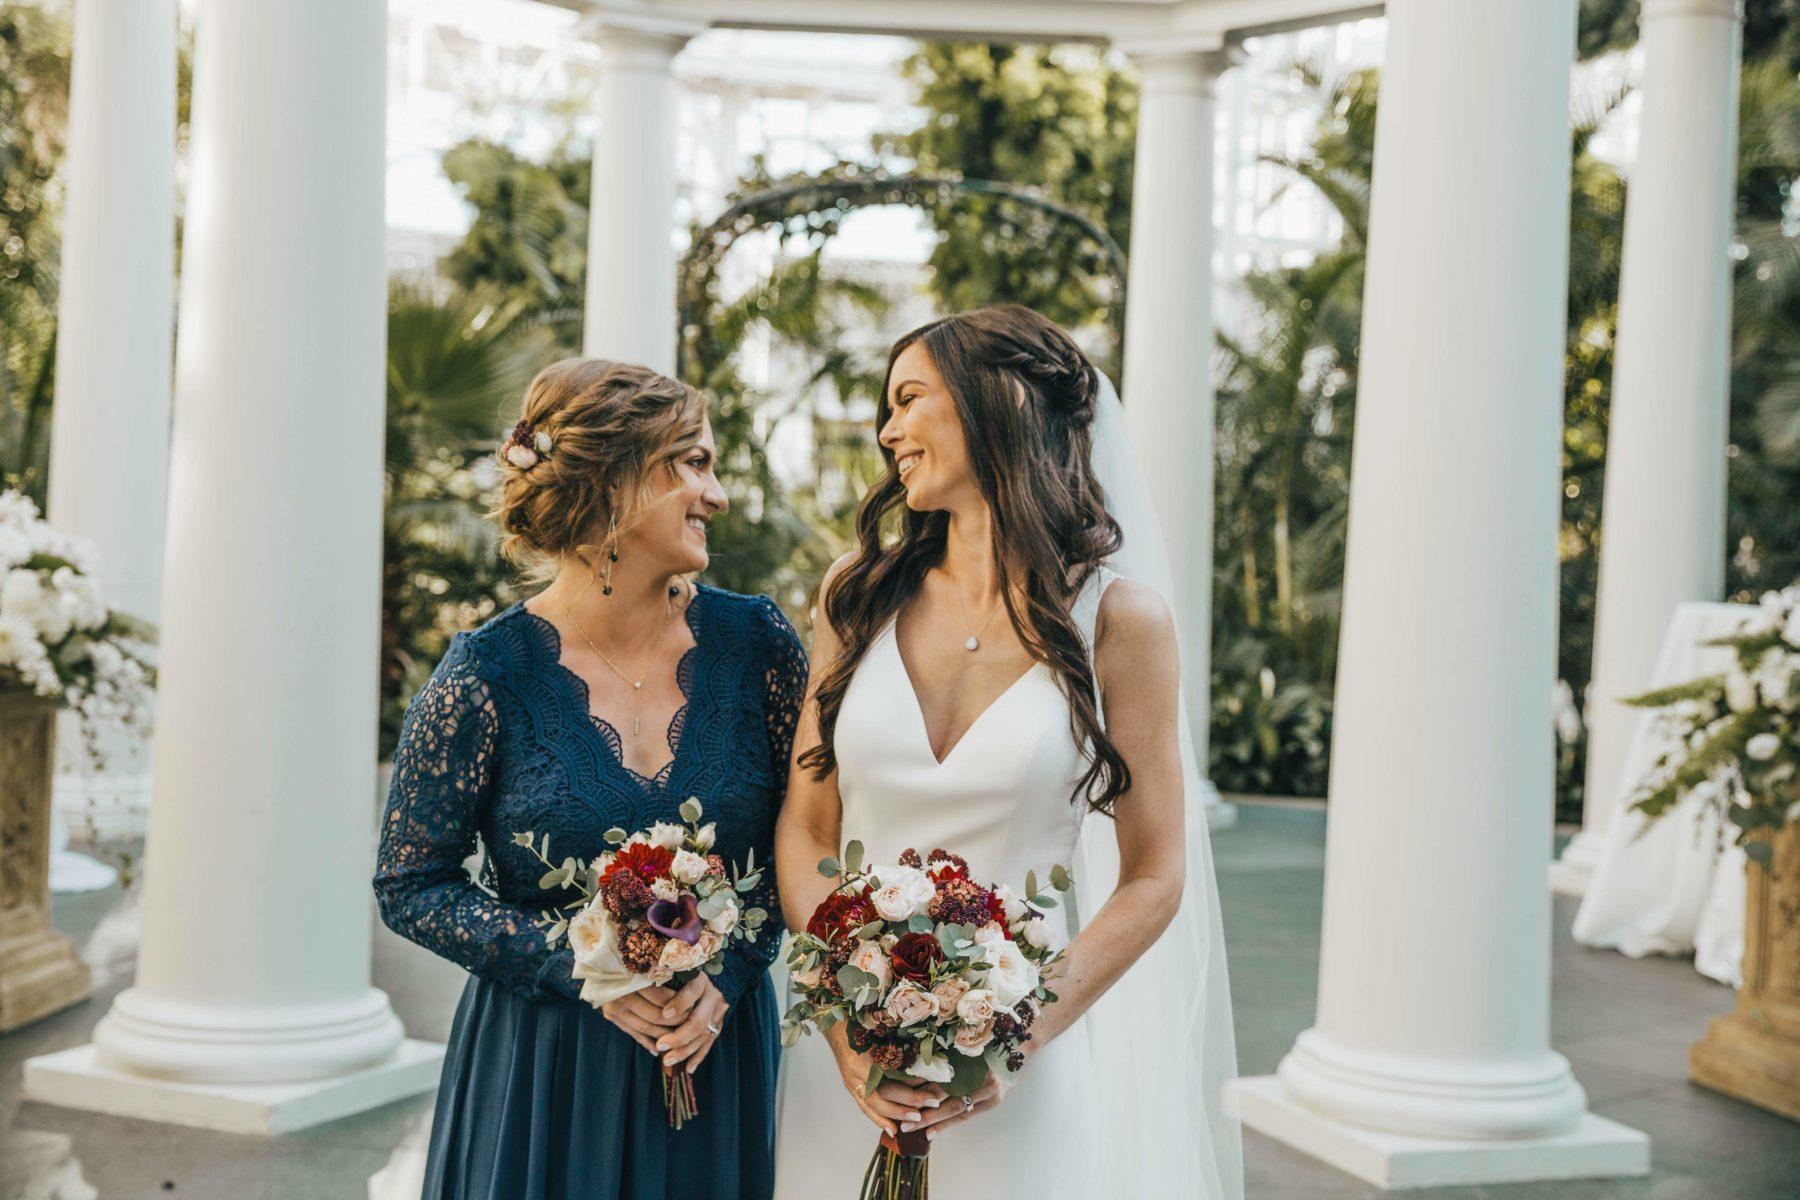 Blue Bridesmaid Dresses from Lulu's